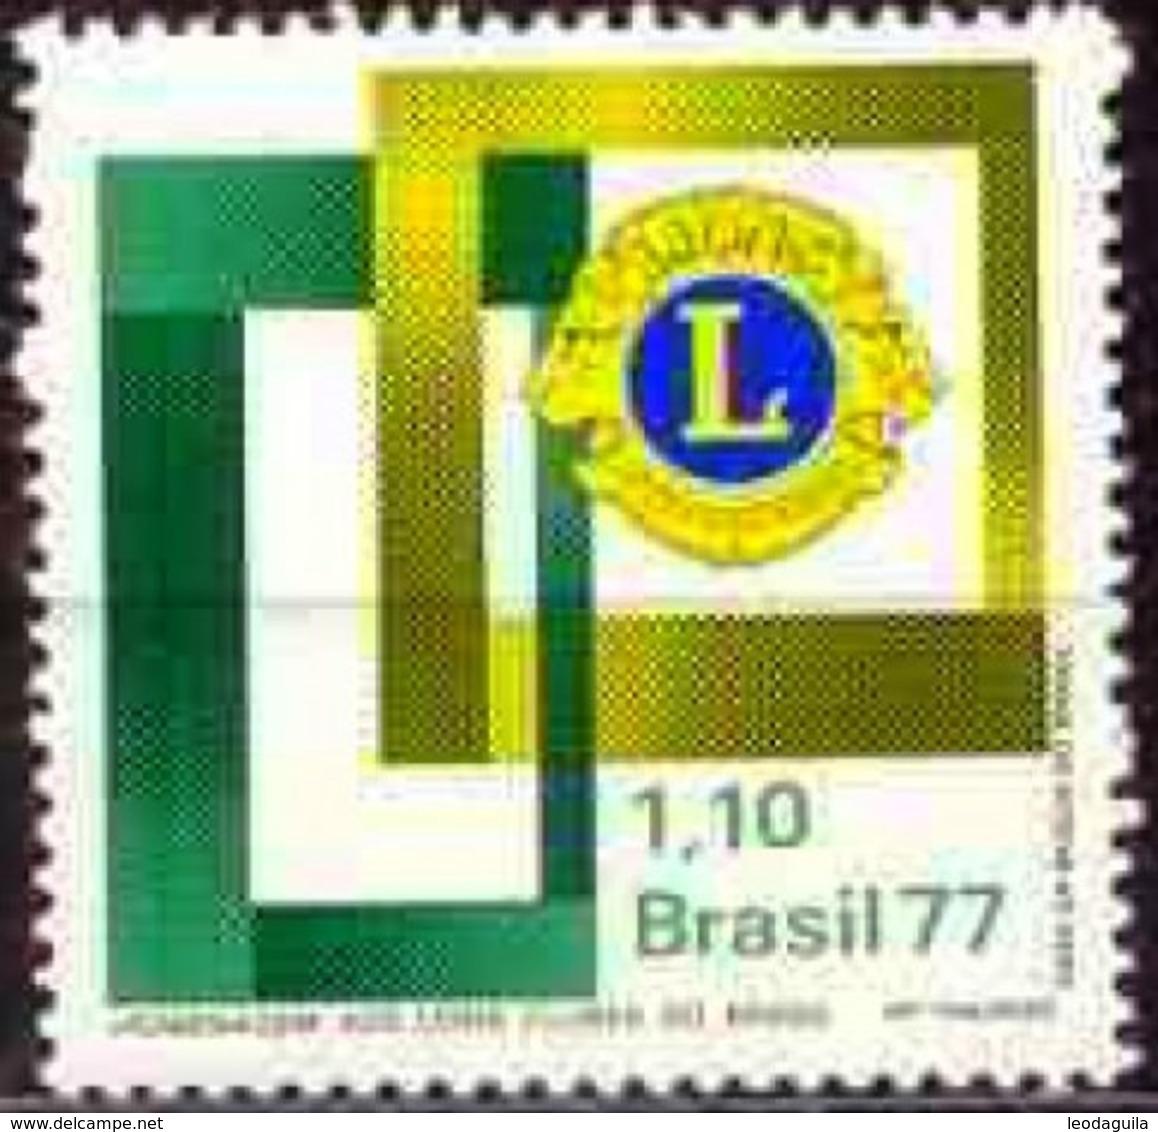 BRAZIL #1499  - LYONS CLUB OF BRAZIL   -  1977  MINT - Unused Stamps